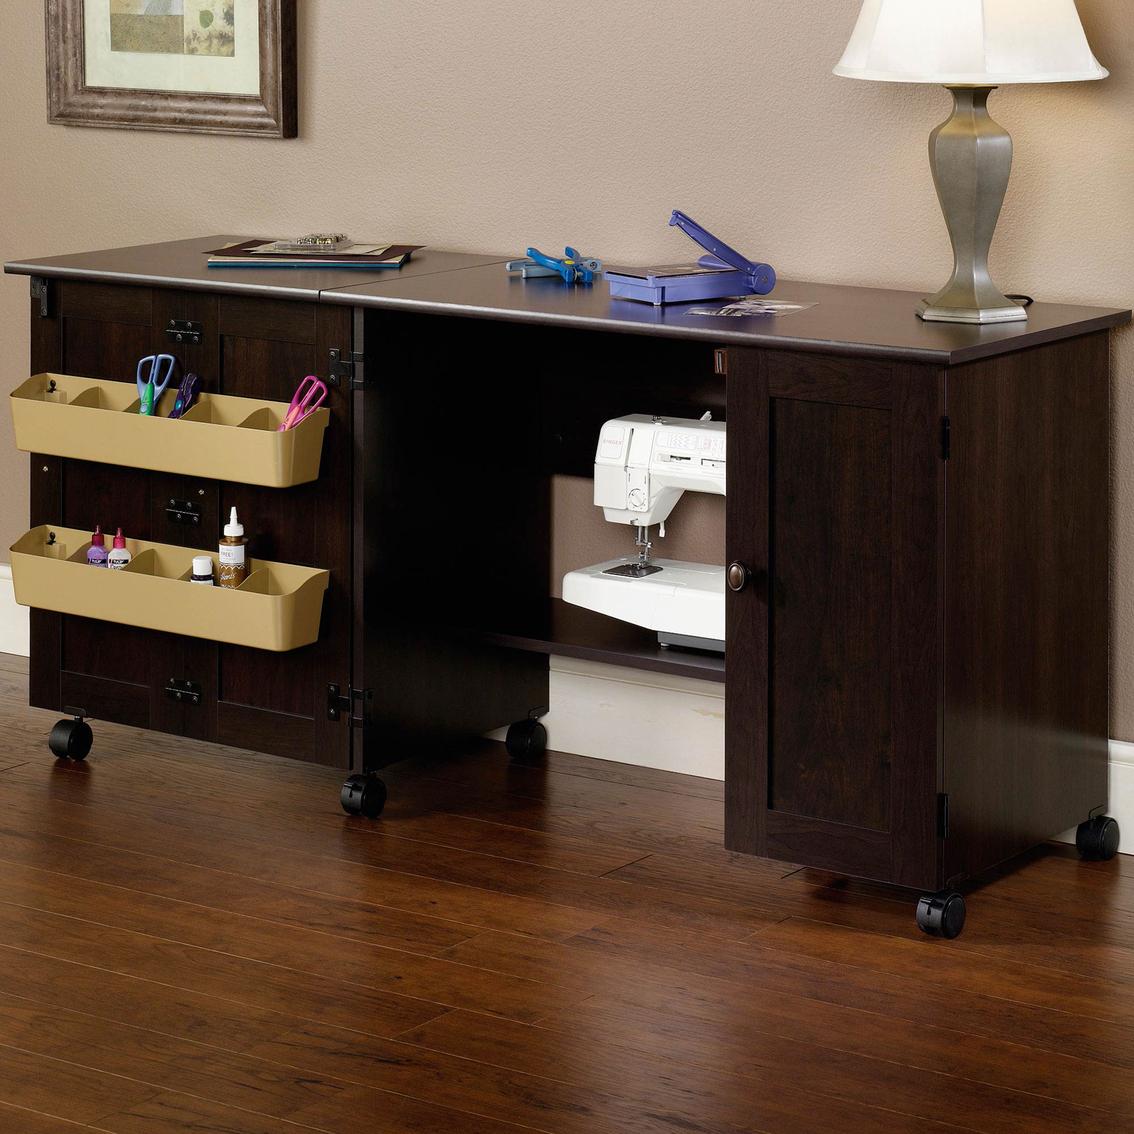 Sauder sewing craft table craft furniture storage for Sauder sewing craft table